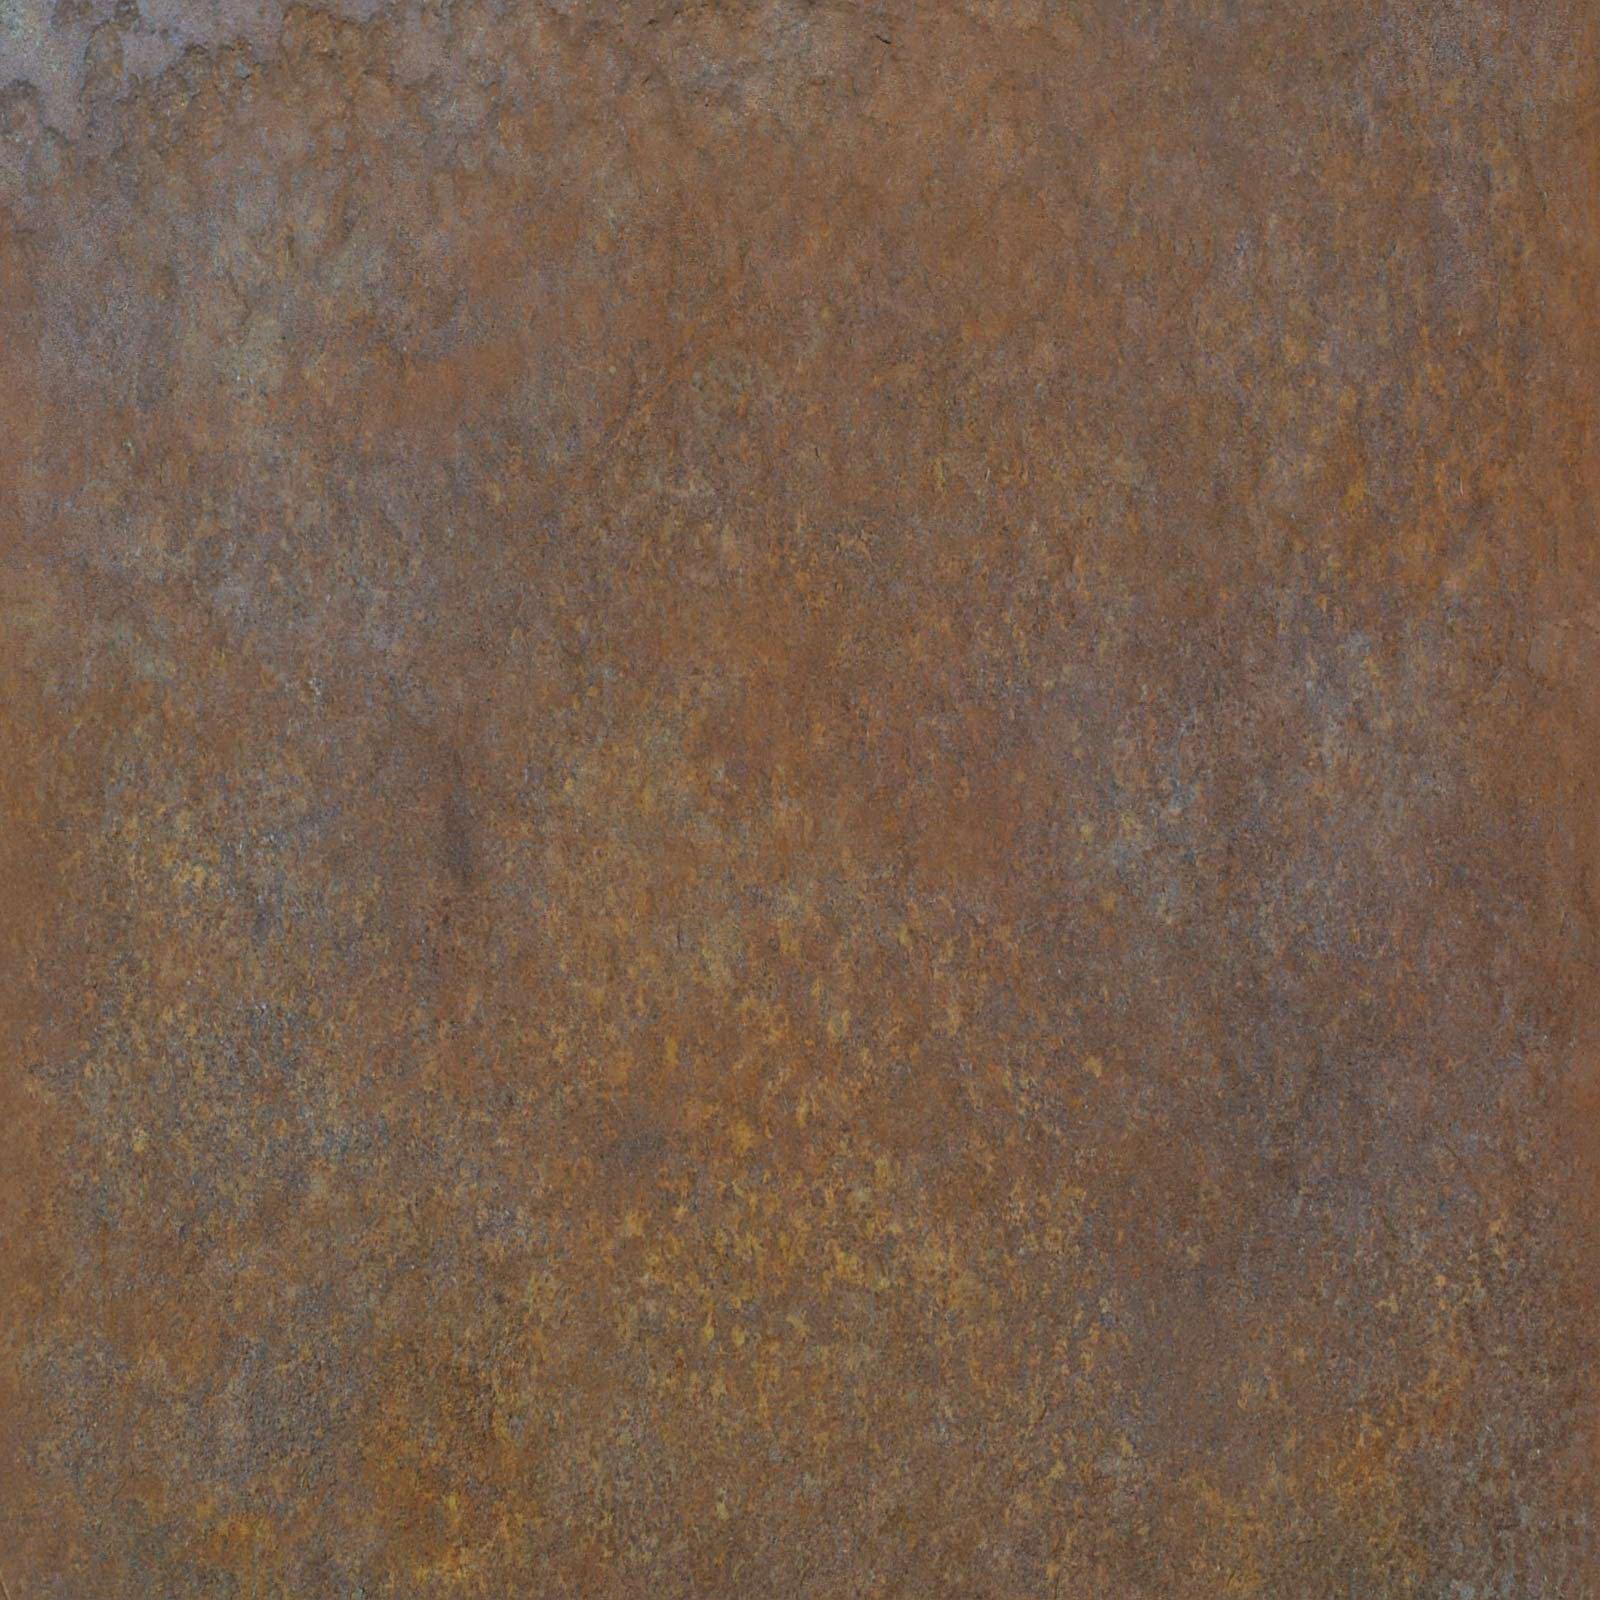 iron, texture, image, iron texture, metal, metal, background, download photo